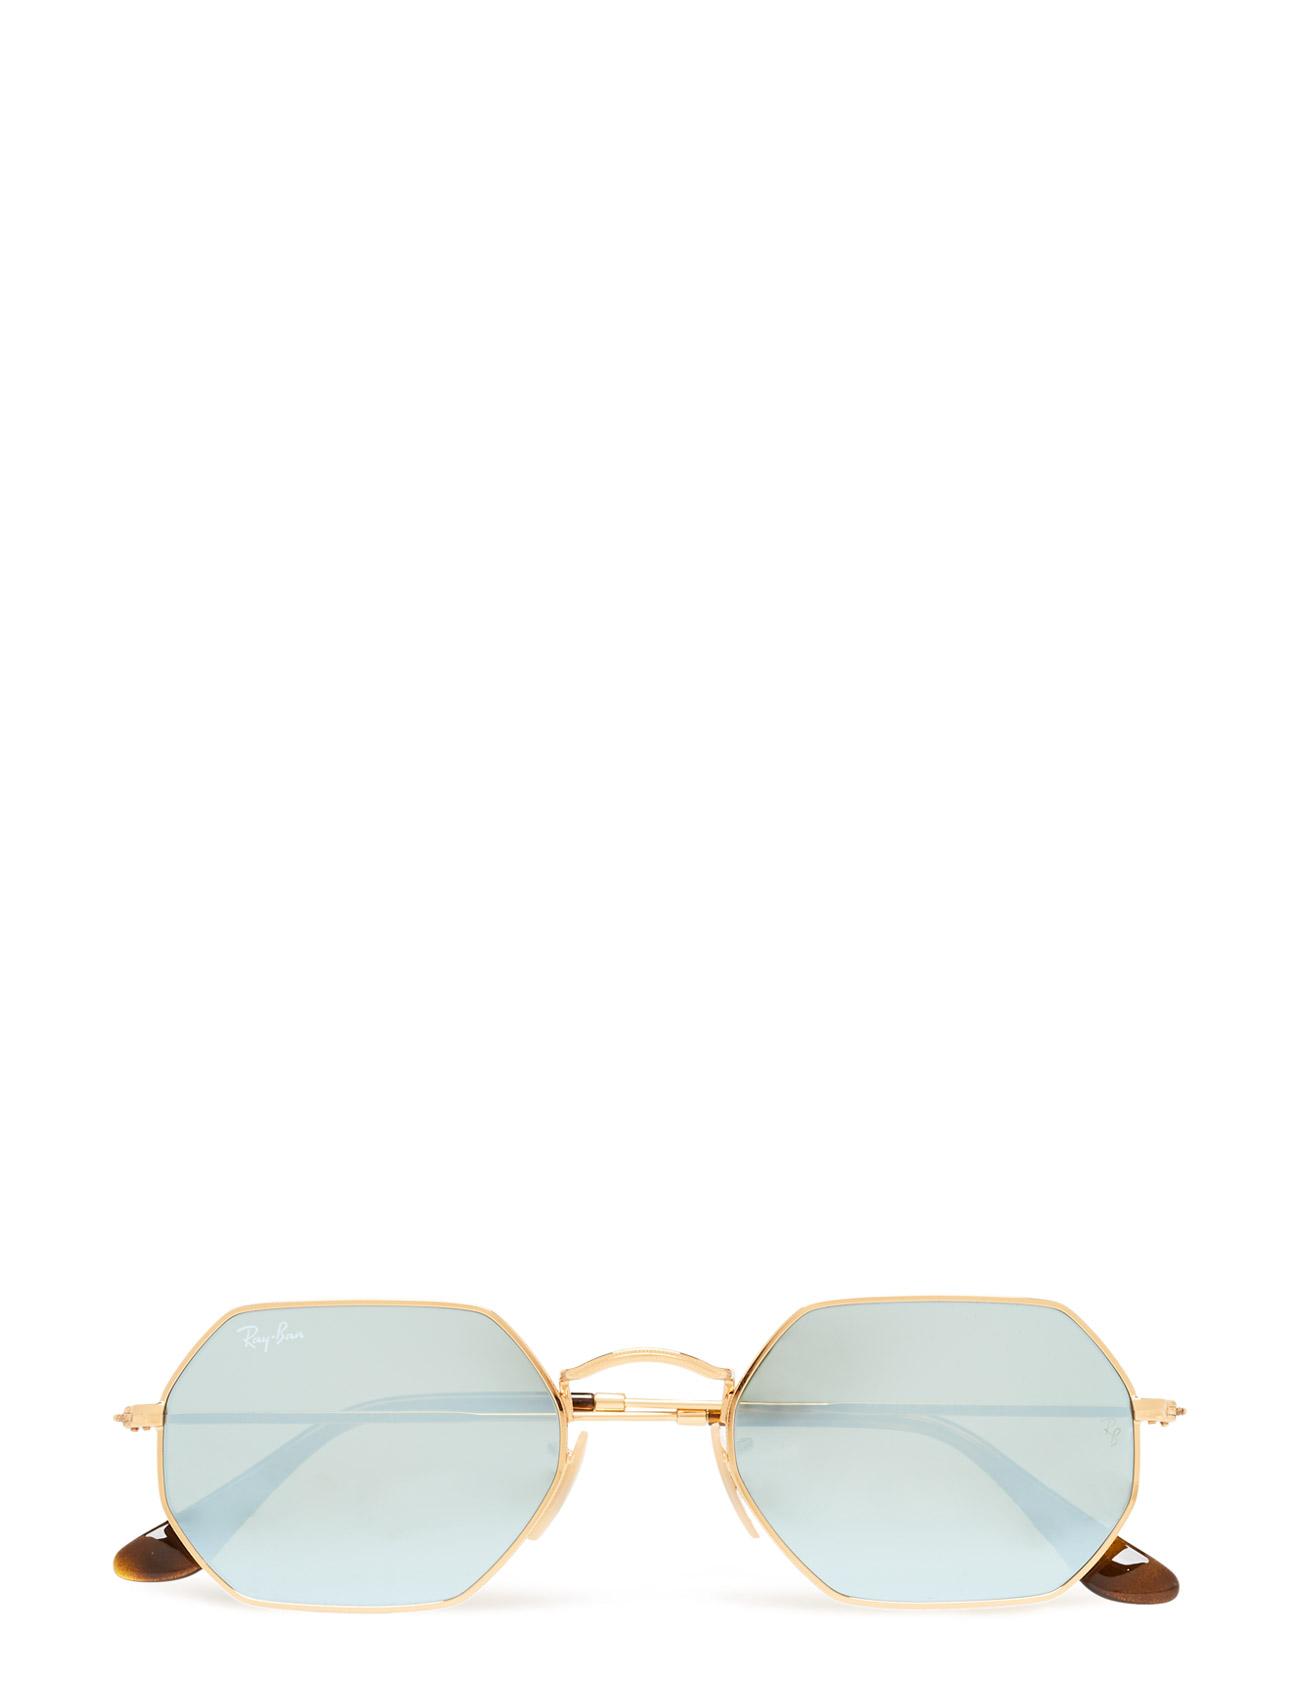 Round Frame Ray-Ban Solbriller til Herrer i